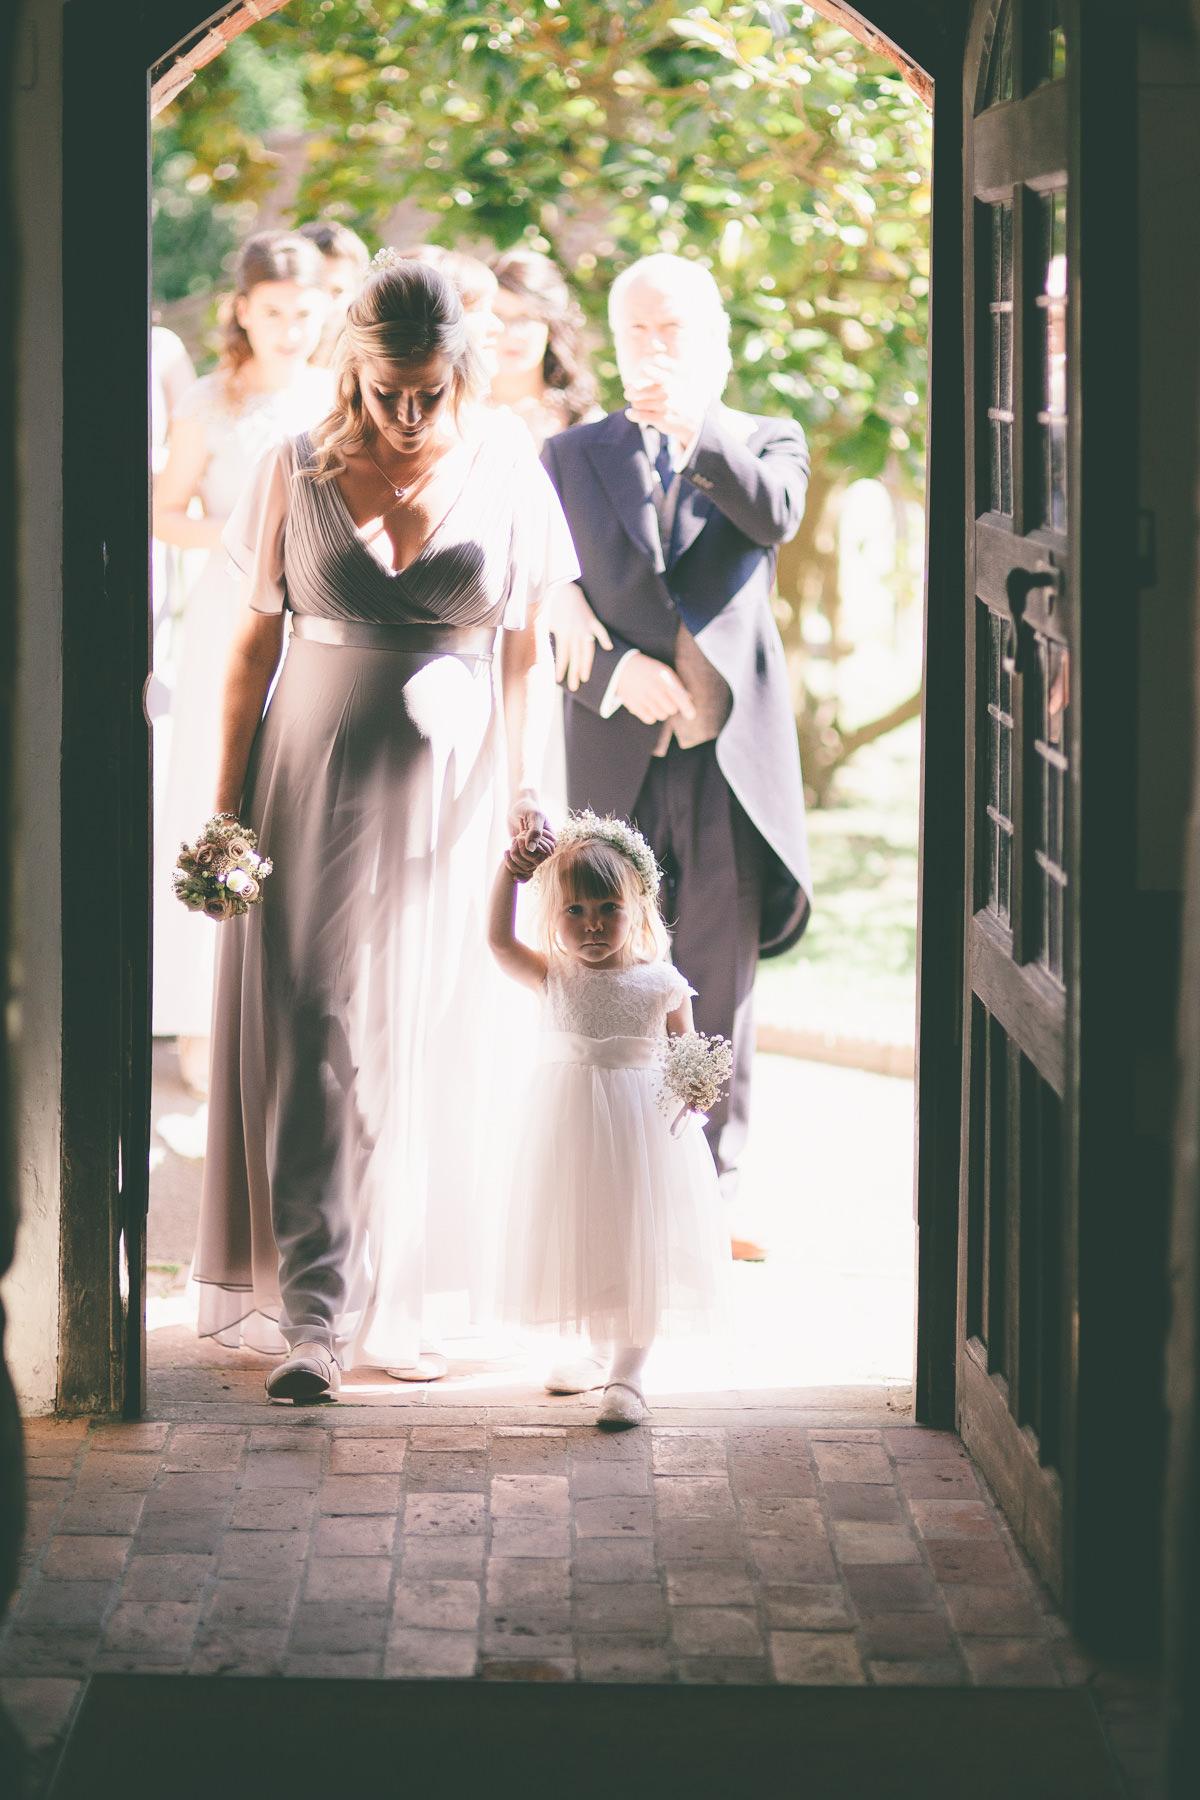 Pamber-Place-wedding-photography-basingstoke-hampshire-146